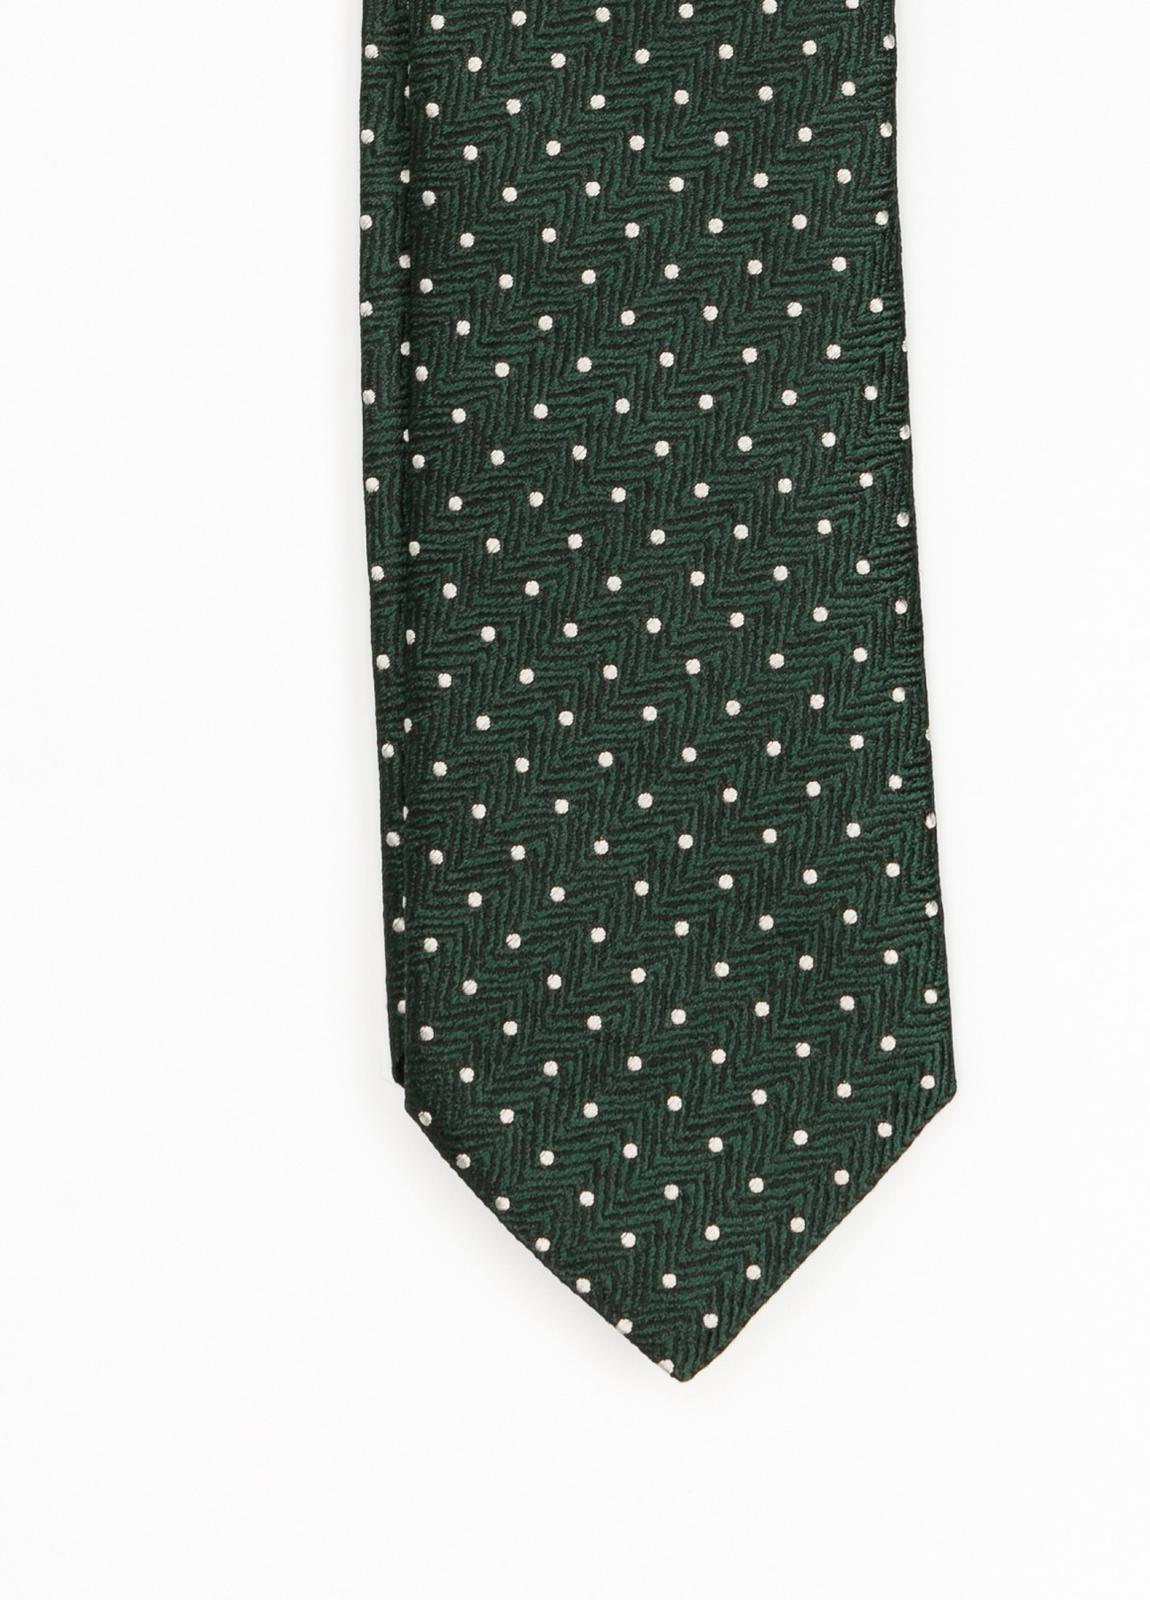 Corbata Formal Wear topitos, color verde. Pala 7,5 cm. 100% Seda. - Ítem1